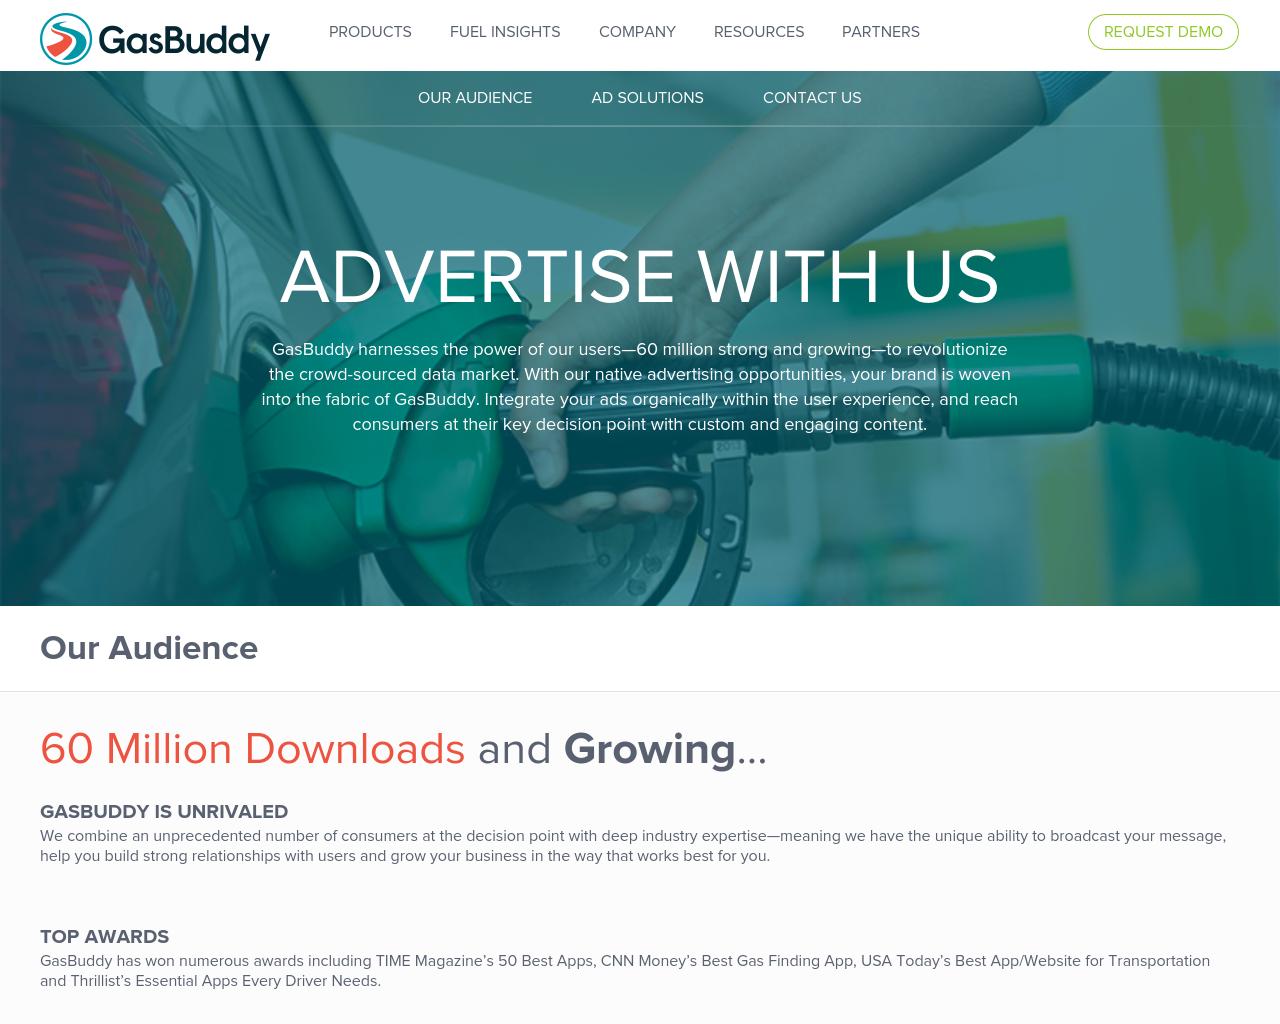 Virginia-GasBuddy-Advertising-Reviews-Pricing